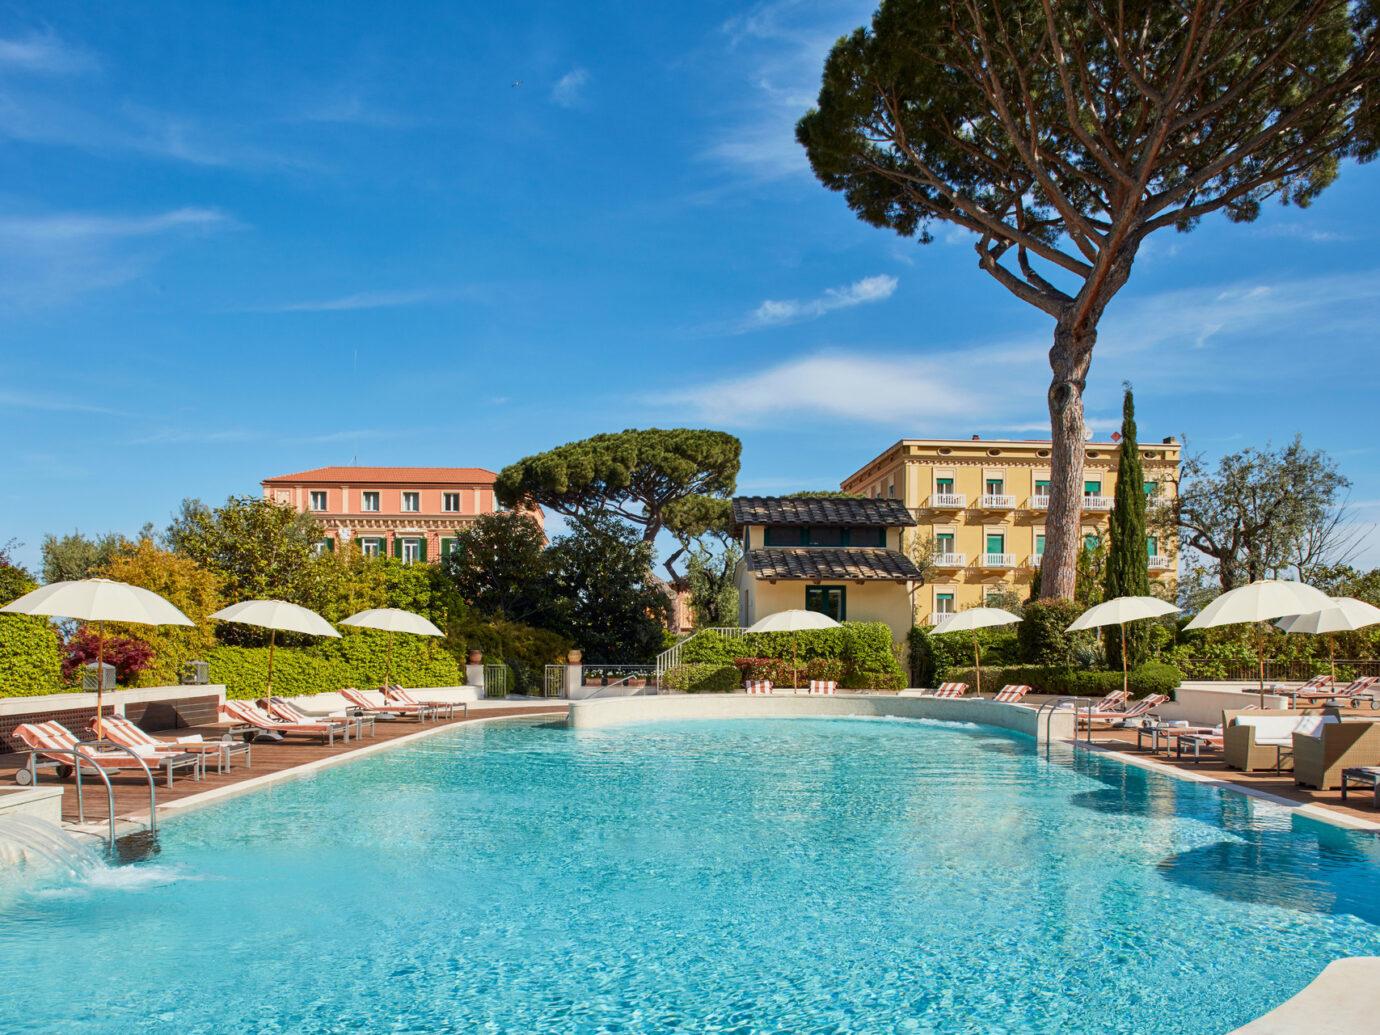 Pool at Grand Hotel Excelsior Vittoria